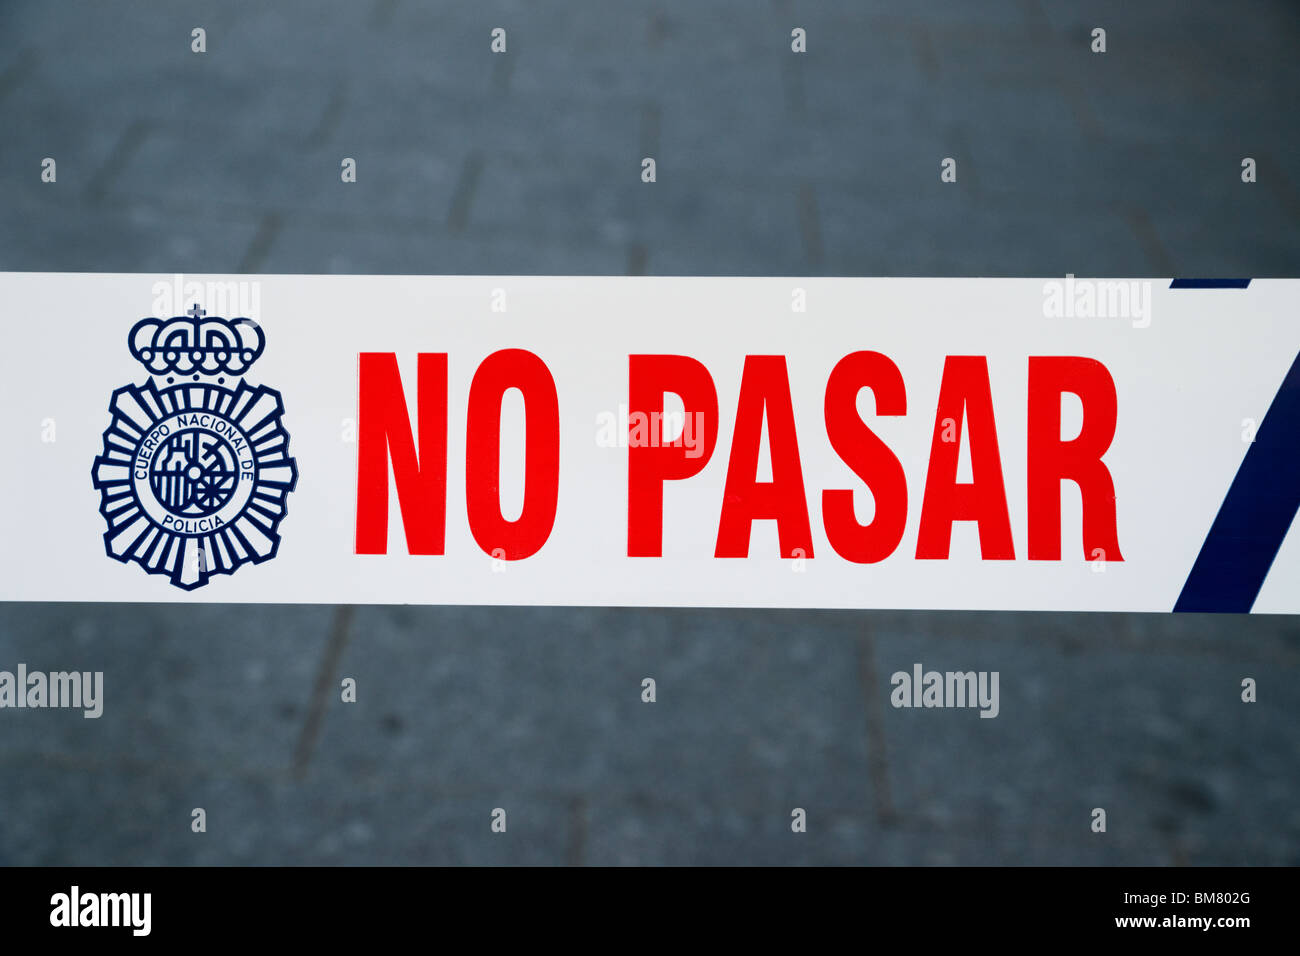 'No pasar' sign - Stock Image